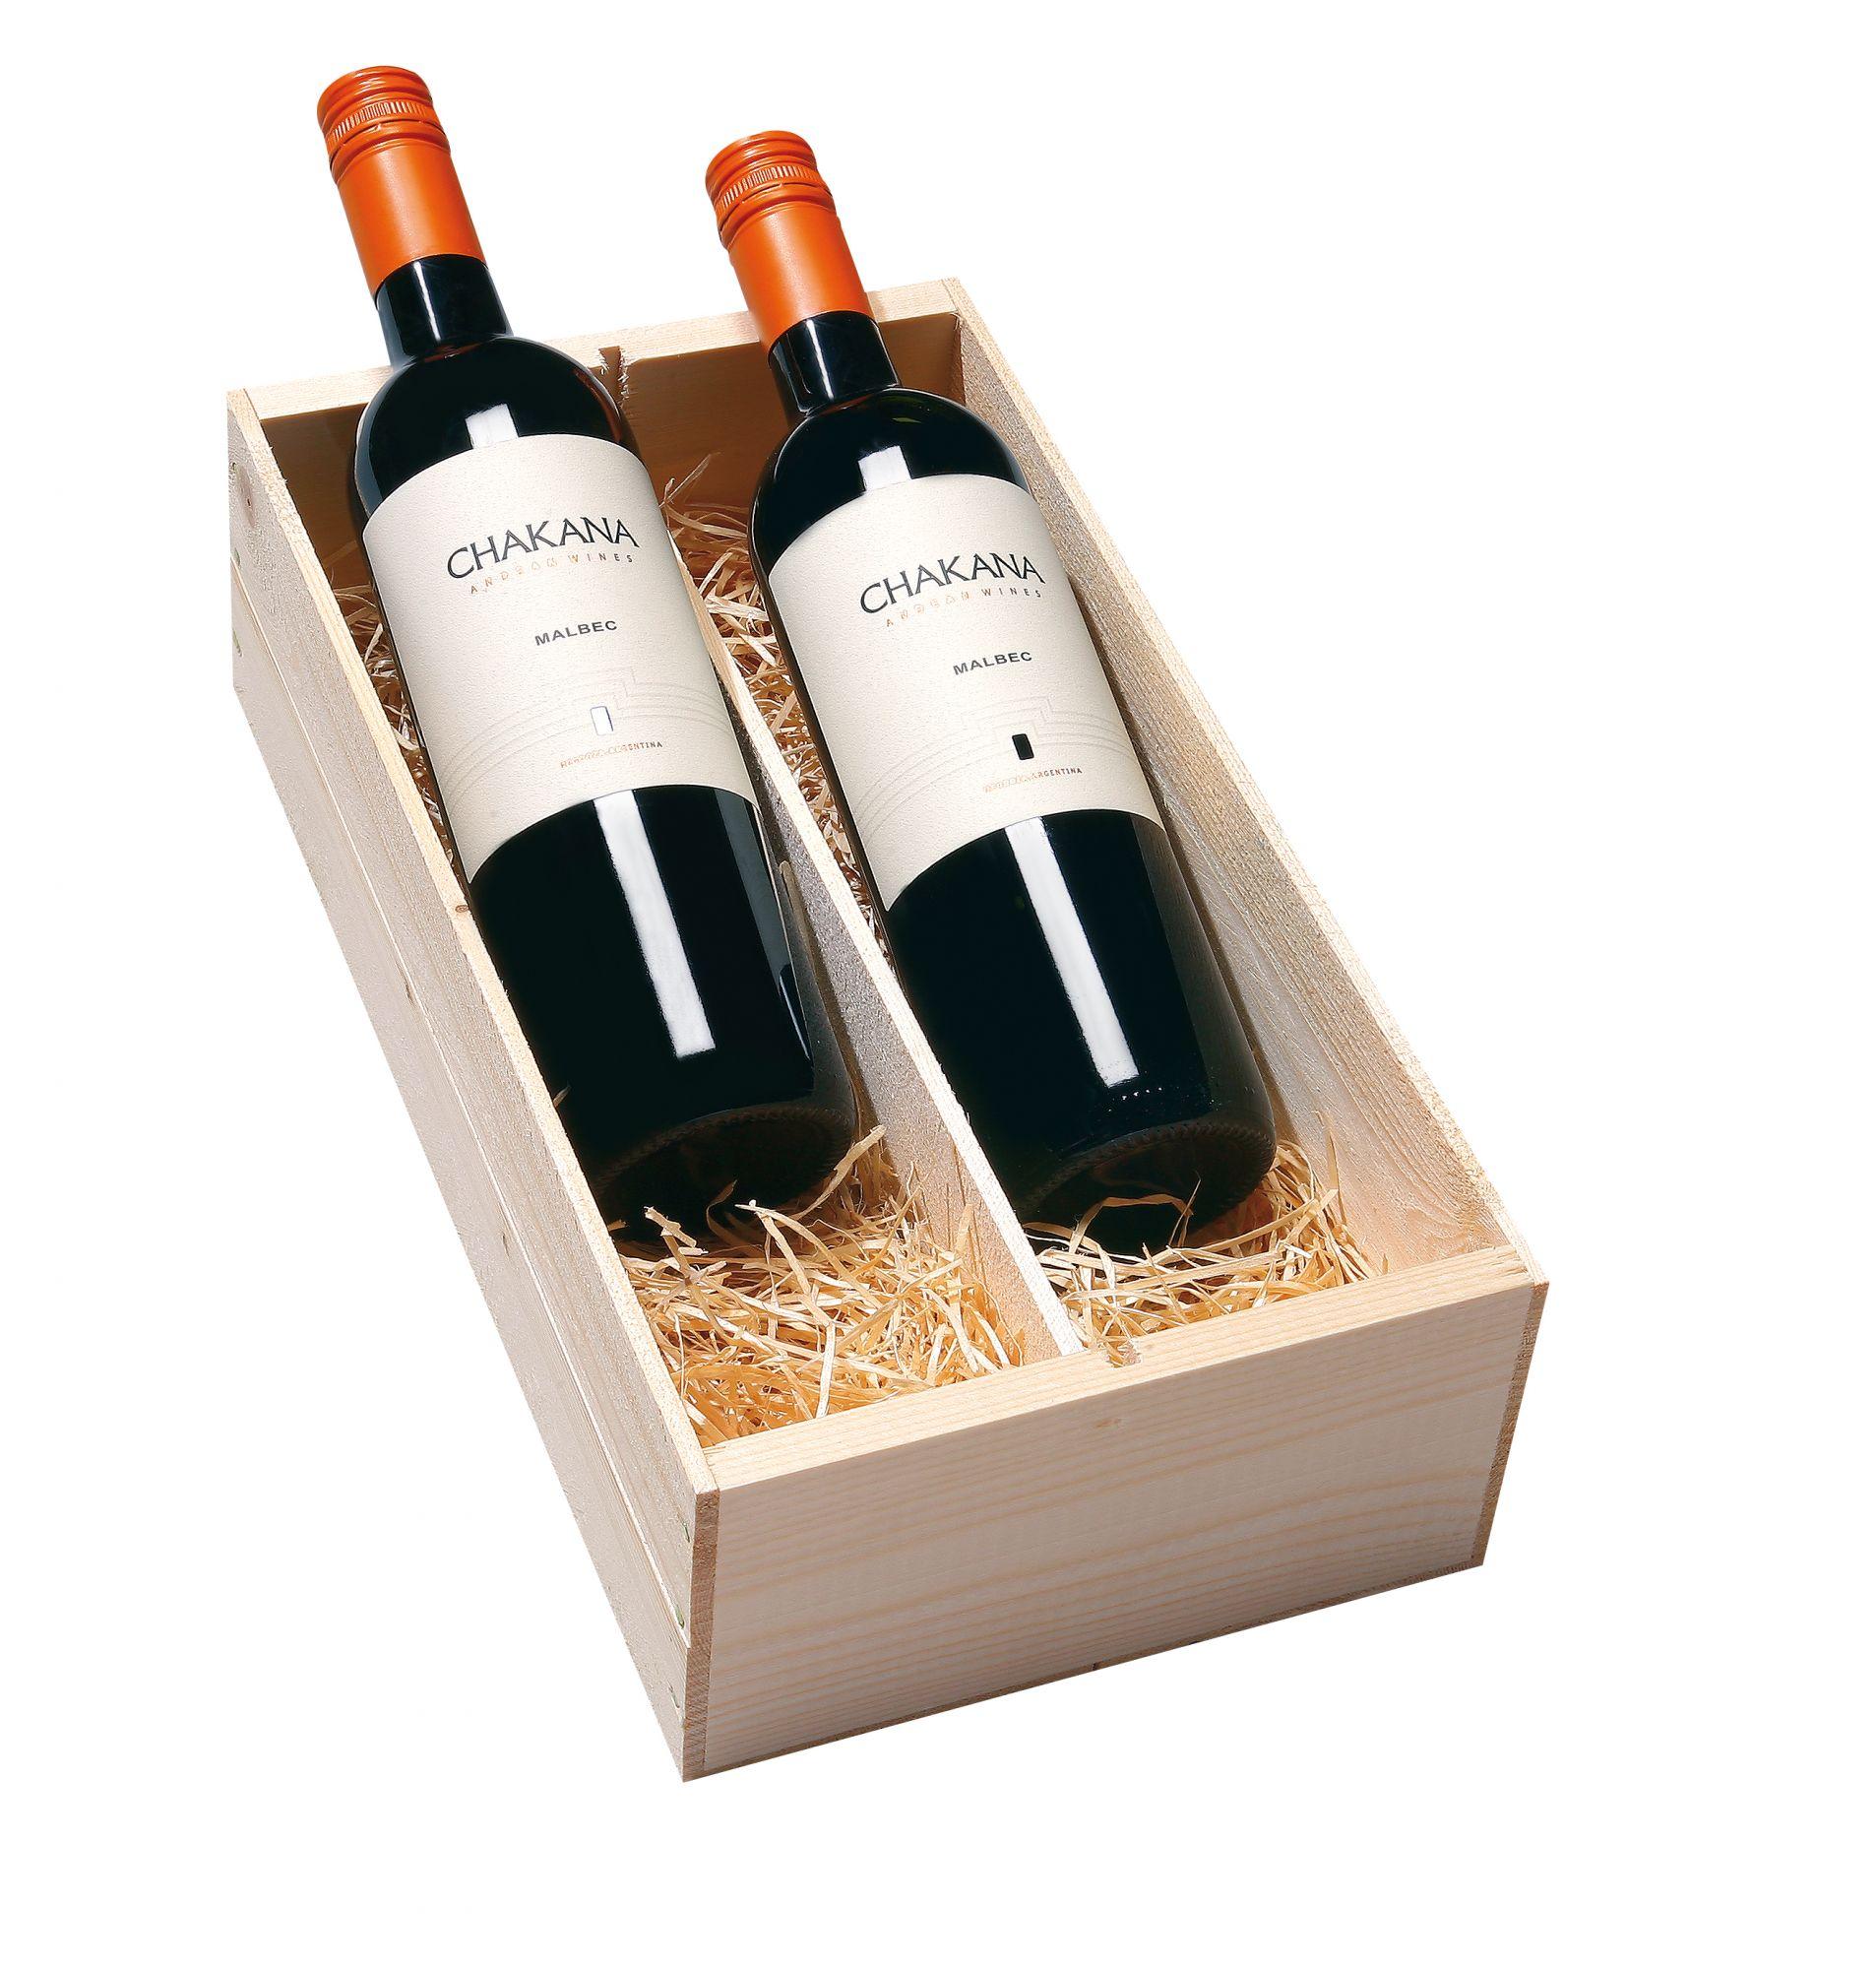 Wijnkist met 2 Chakana Mendoza Malbec